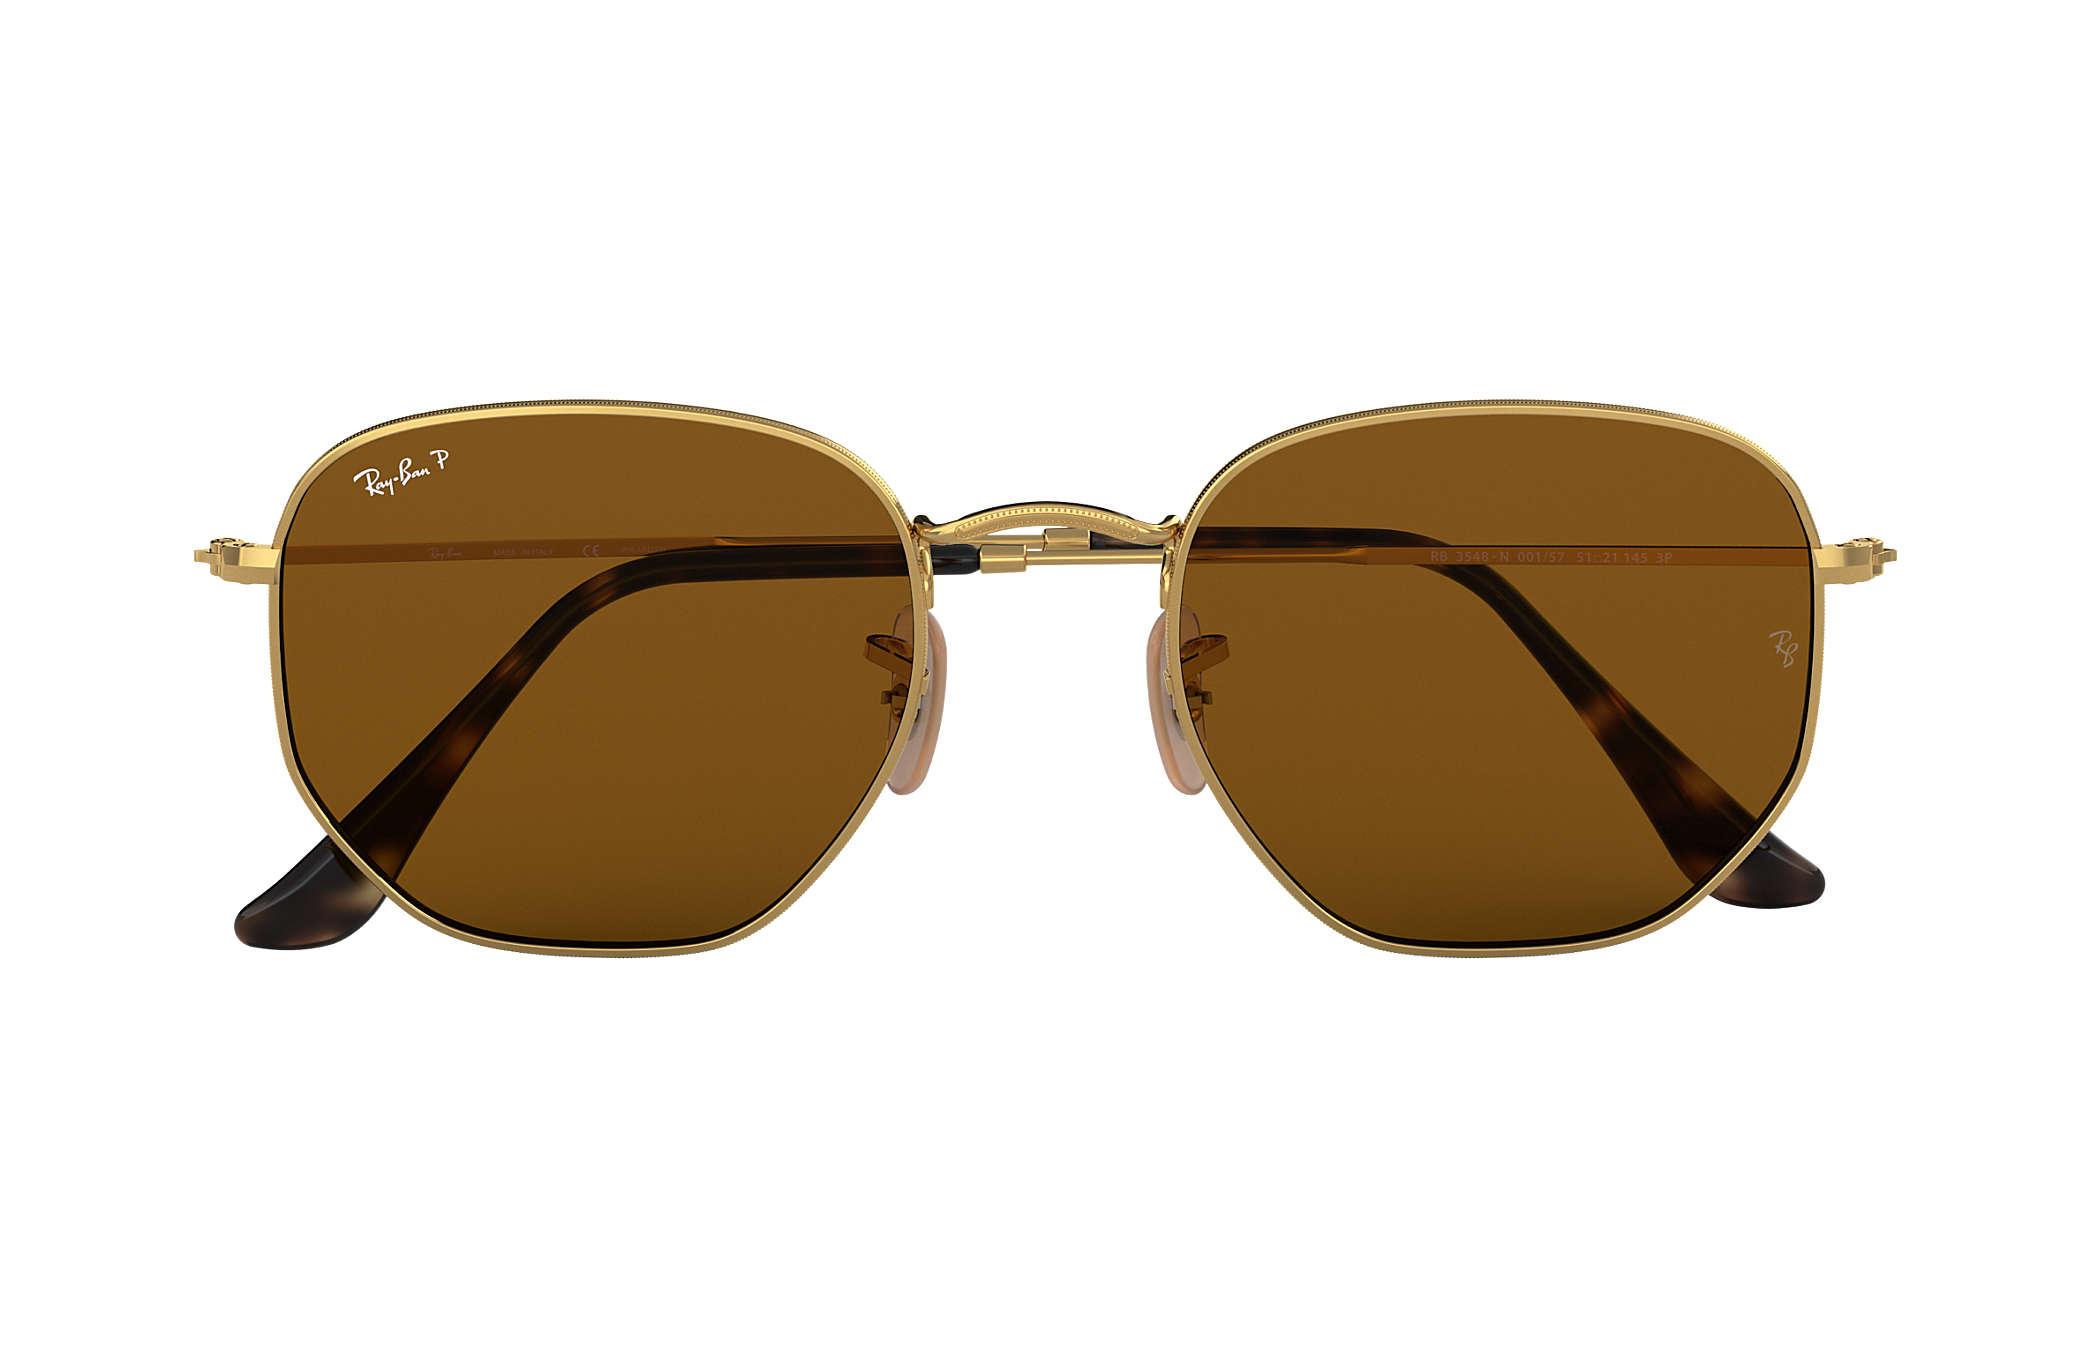 858fea81f1159 Ray-Ban Hexagonal Flat Lenses RB3548N Gold - Metal - Brown Polarized ...